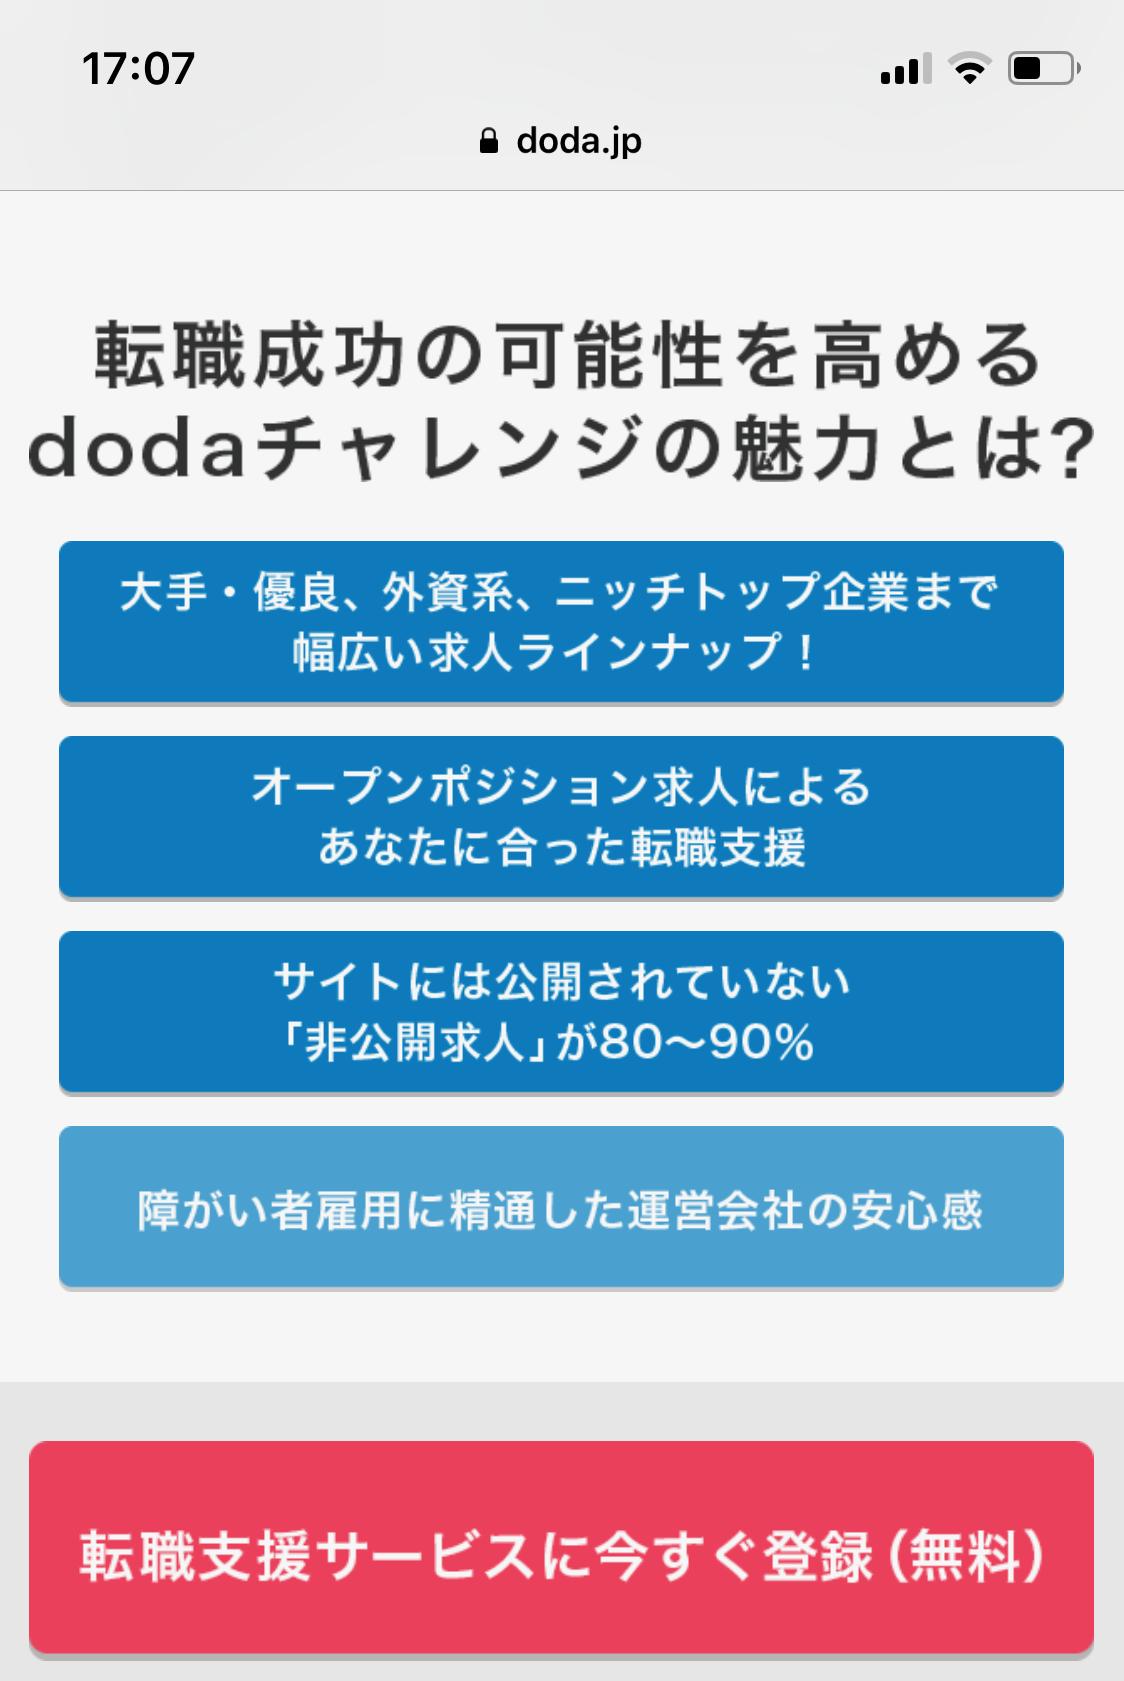 dodaチャレンジ登録画面